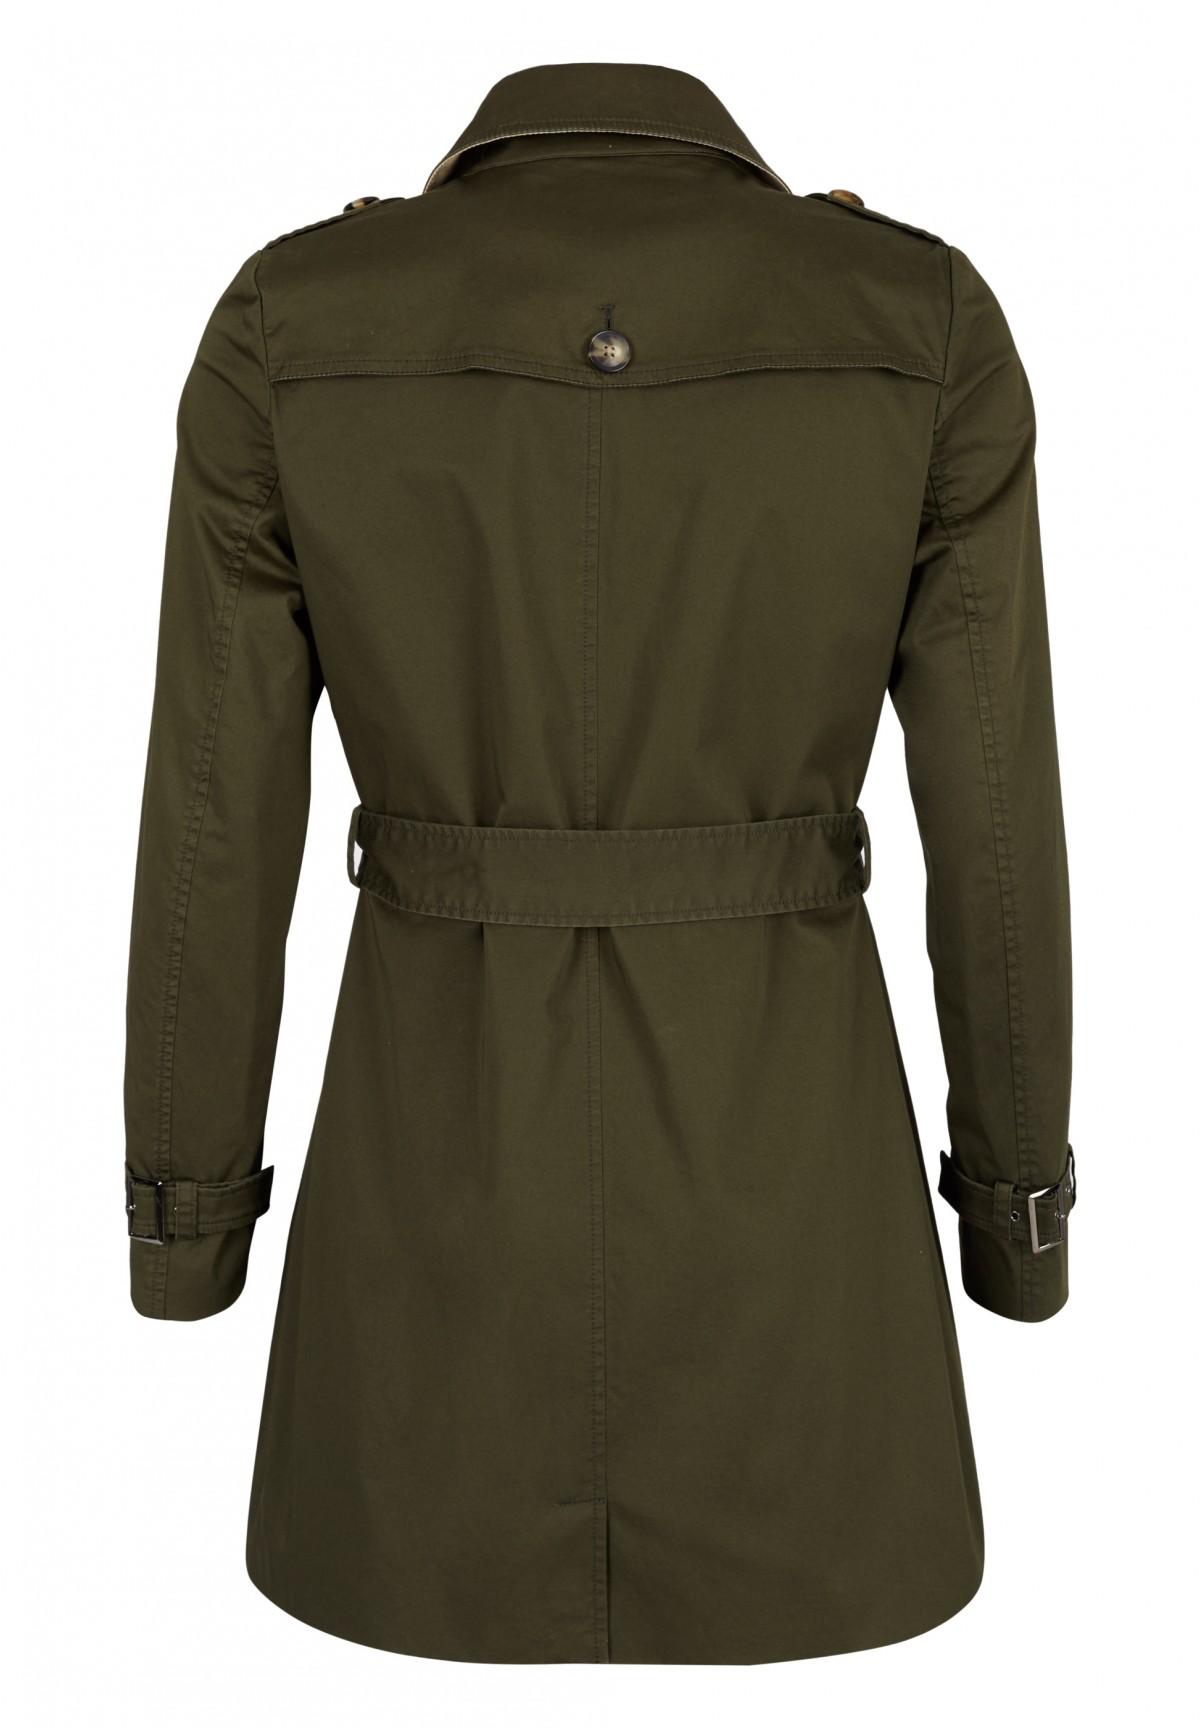 Trenchcoat mit modischen Details / Trenchcoat